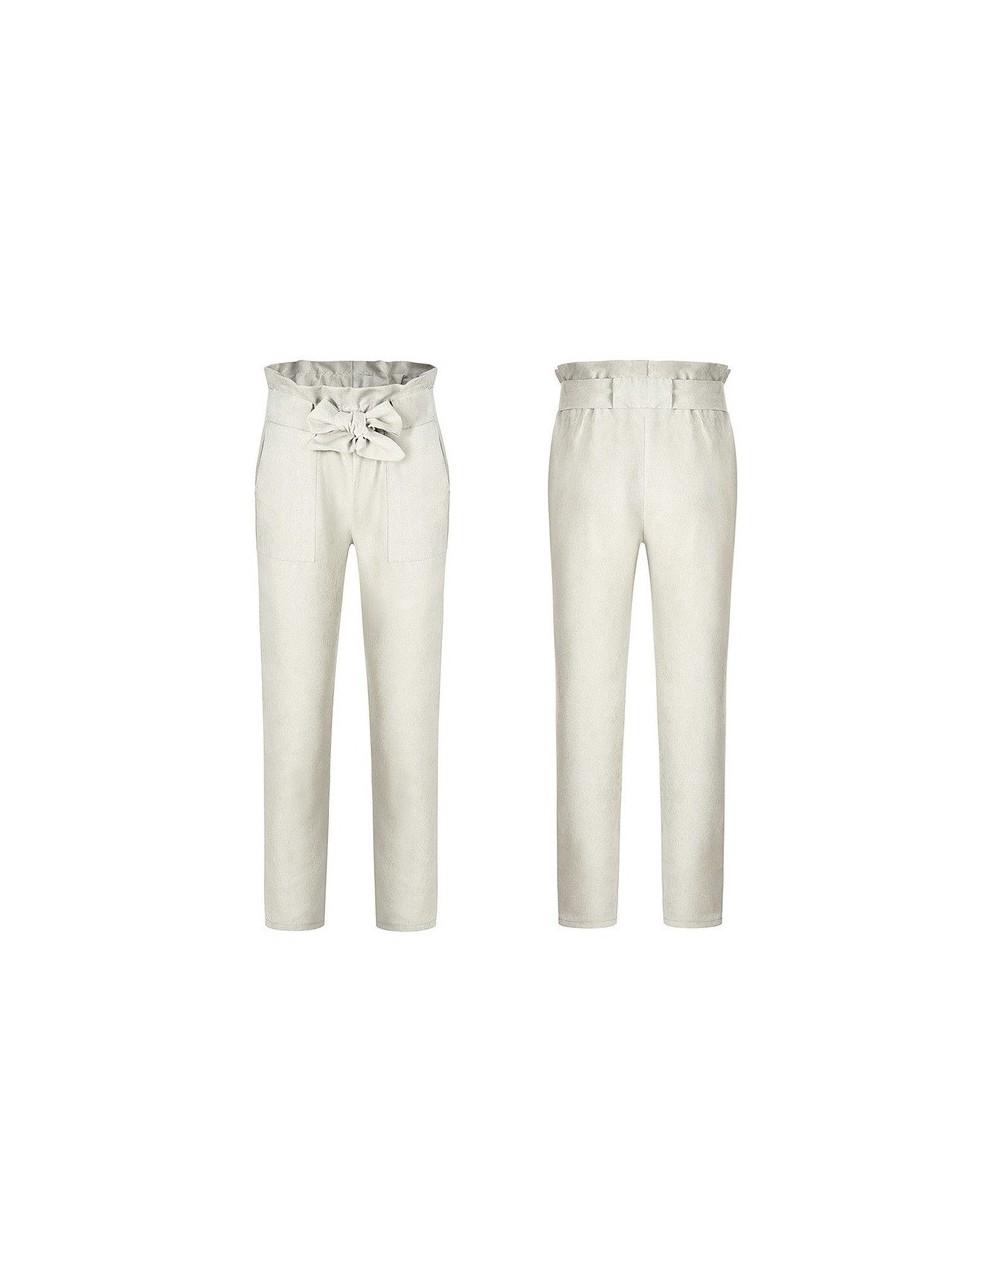 Fashion Women's High Waist Drawstring Elastic Long Pants Casual Pencil Trousers - White - 4O3015881449-9